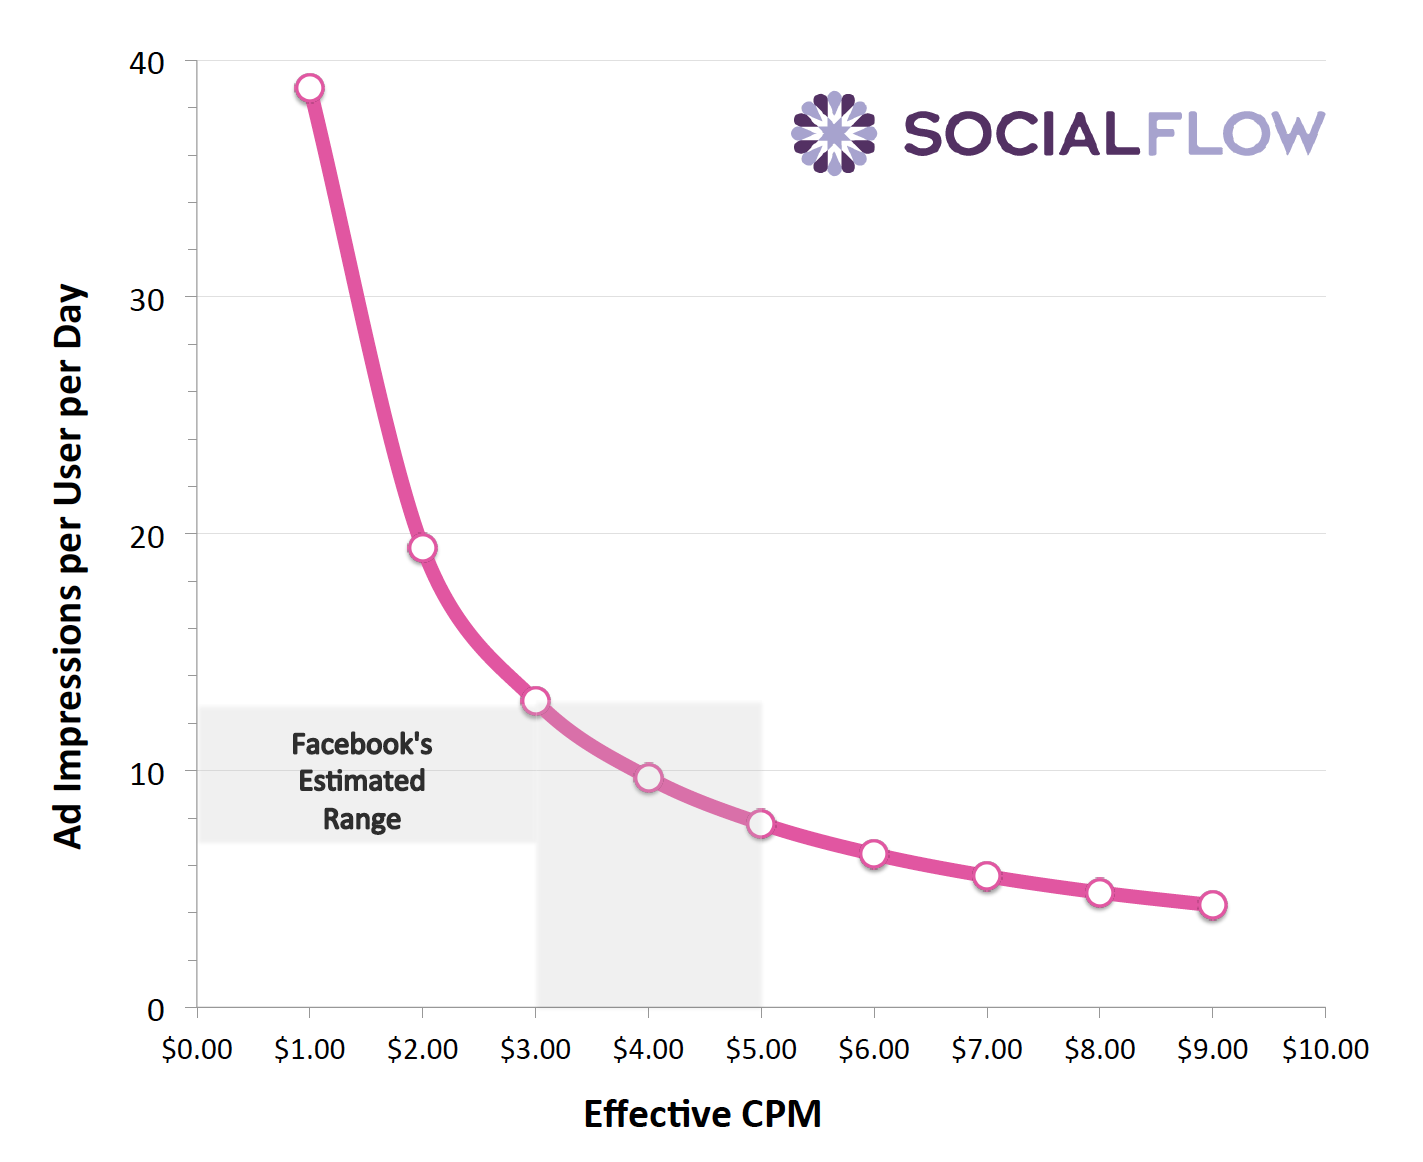 fb-social-flow